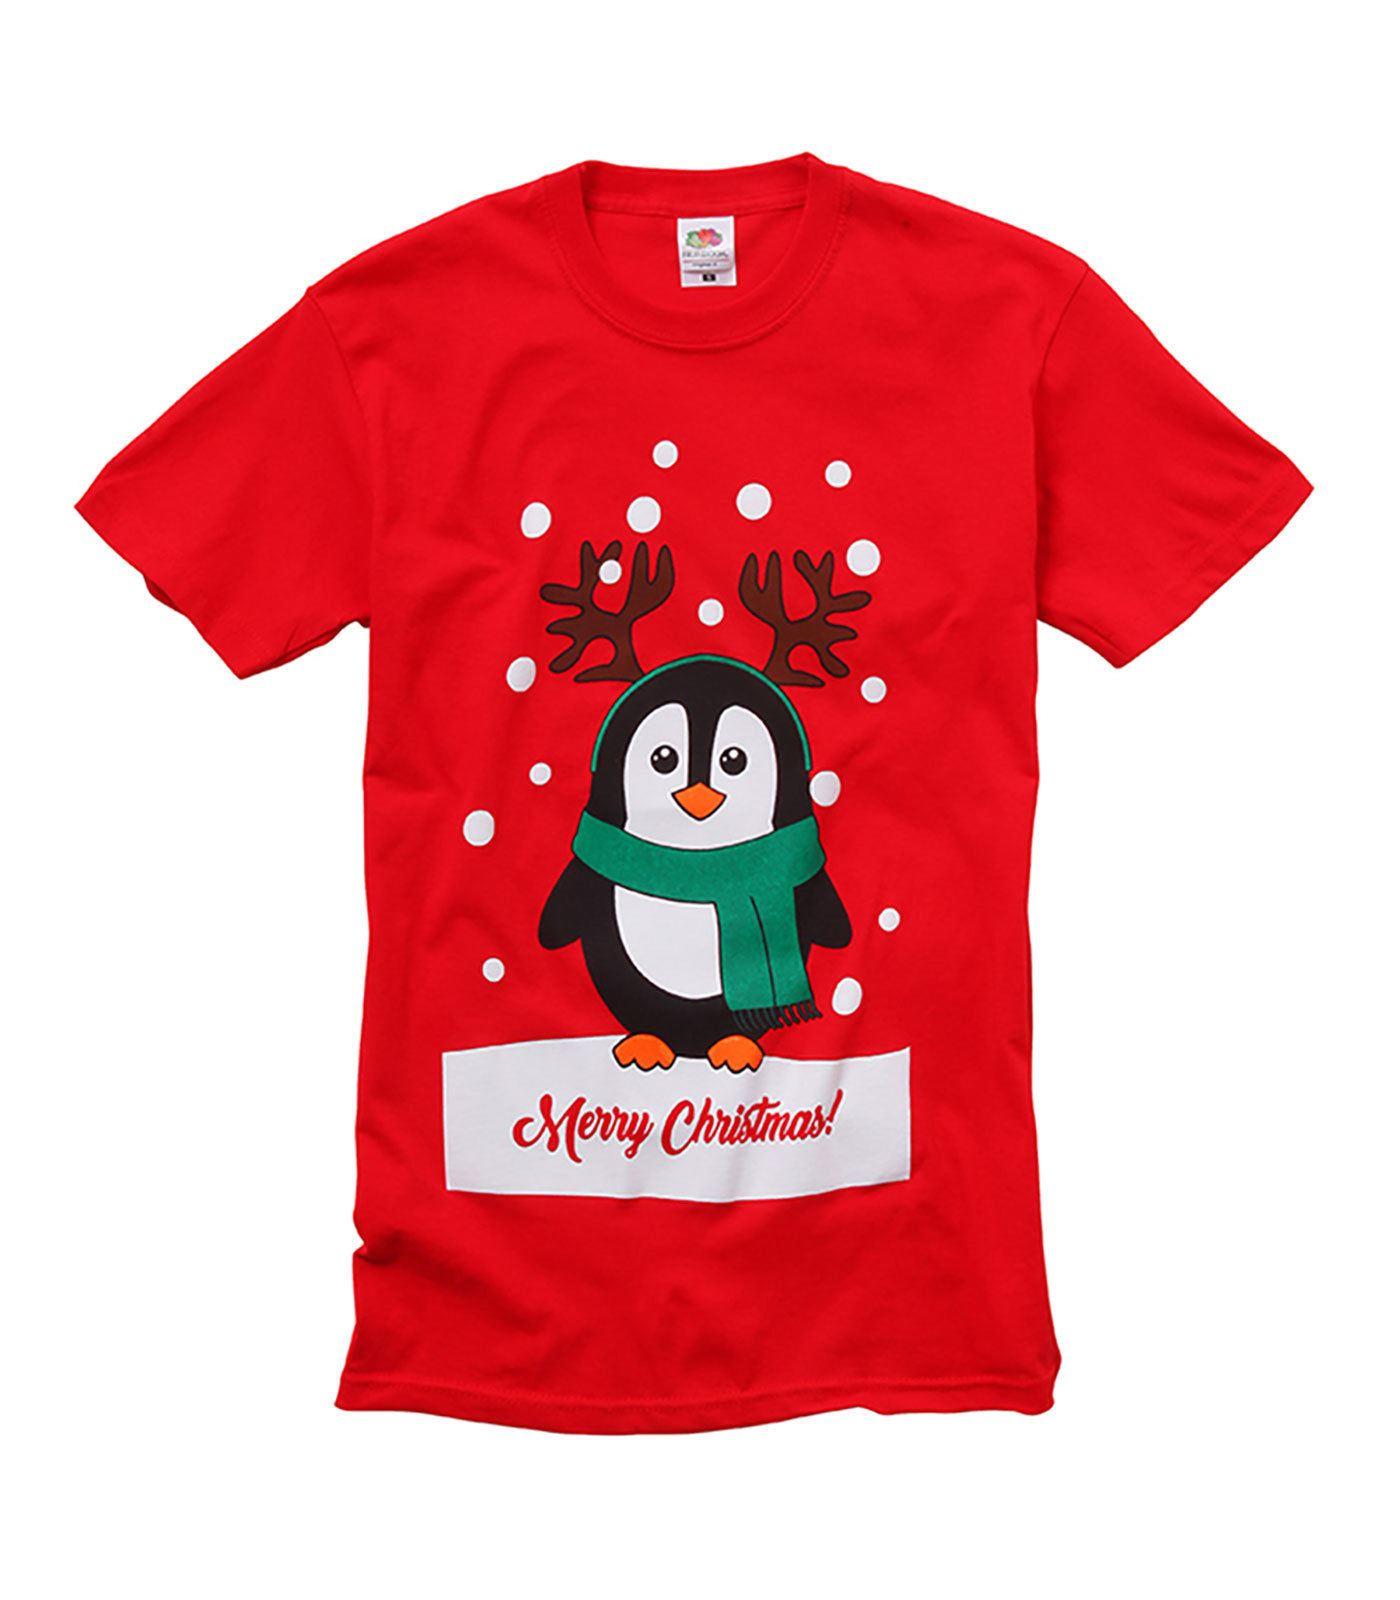 Christmas T-shirts Bah Humbug Reindeer red Black XMAS Tee Penguin Santa